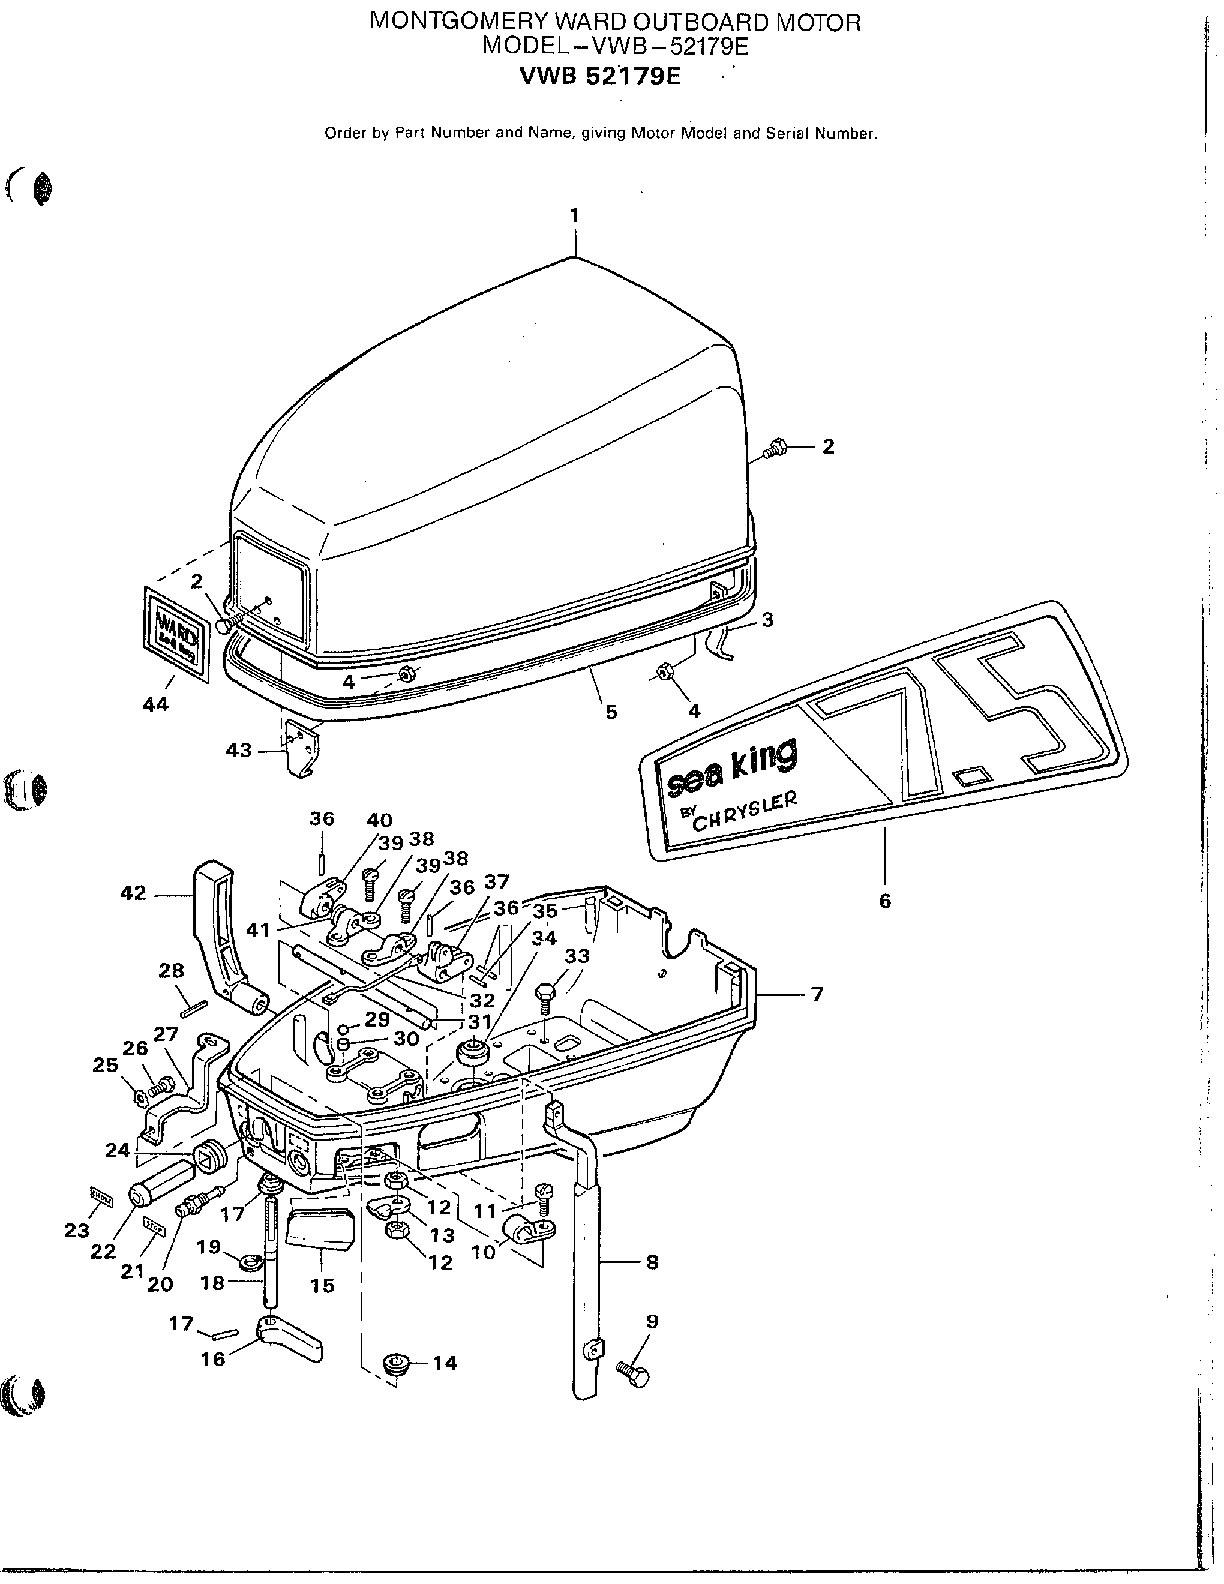 Diagram 7 5 Hp Mercury Outboard Wiring Diagram Full Version Hd Quality Wiring Diagram Diagramsernae Gisbertovalori It